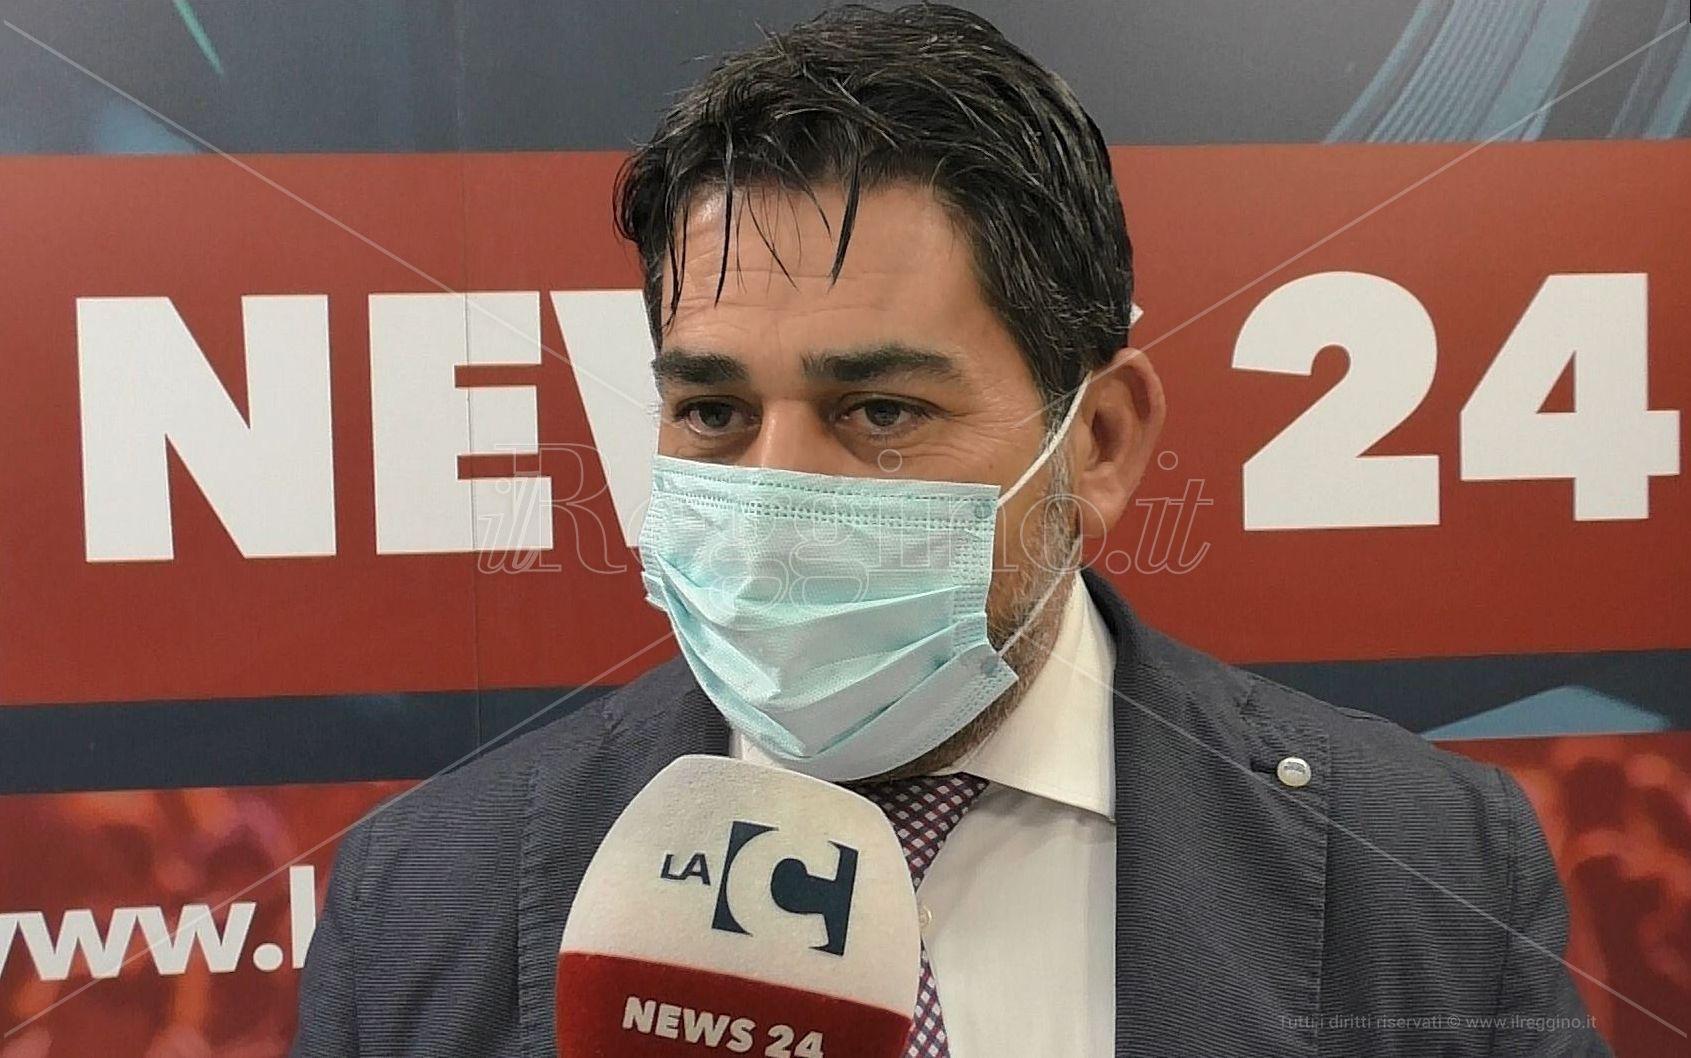 Rifiuti, Brunetti: «Da De Magistris solo becera campagna elettorale»